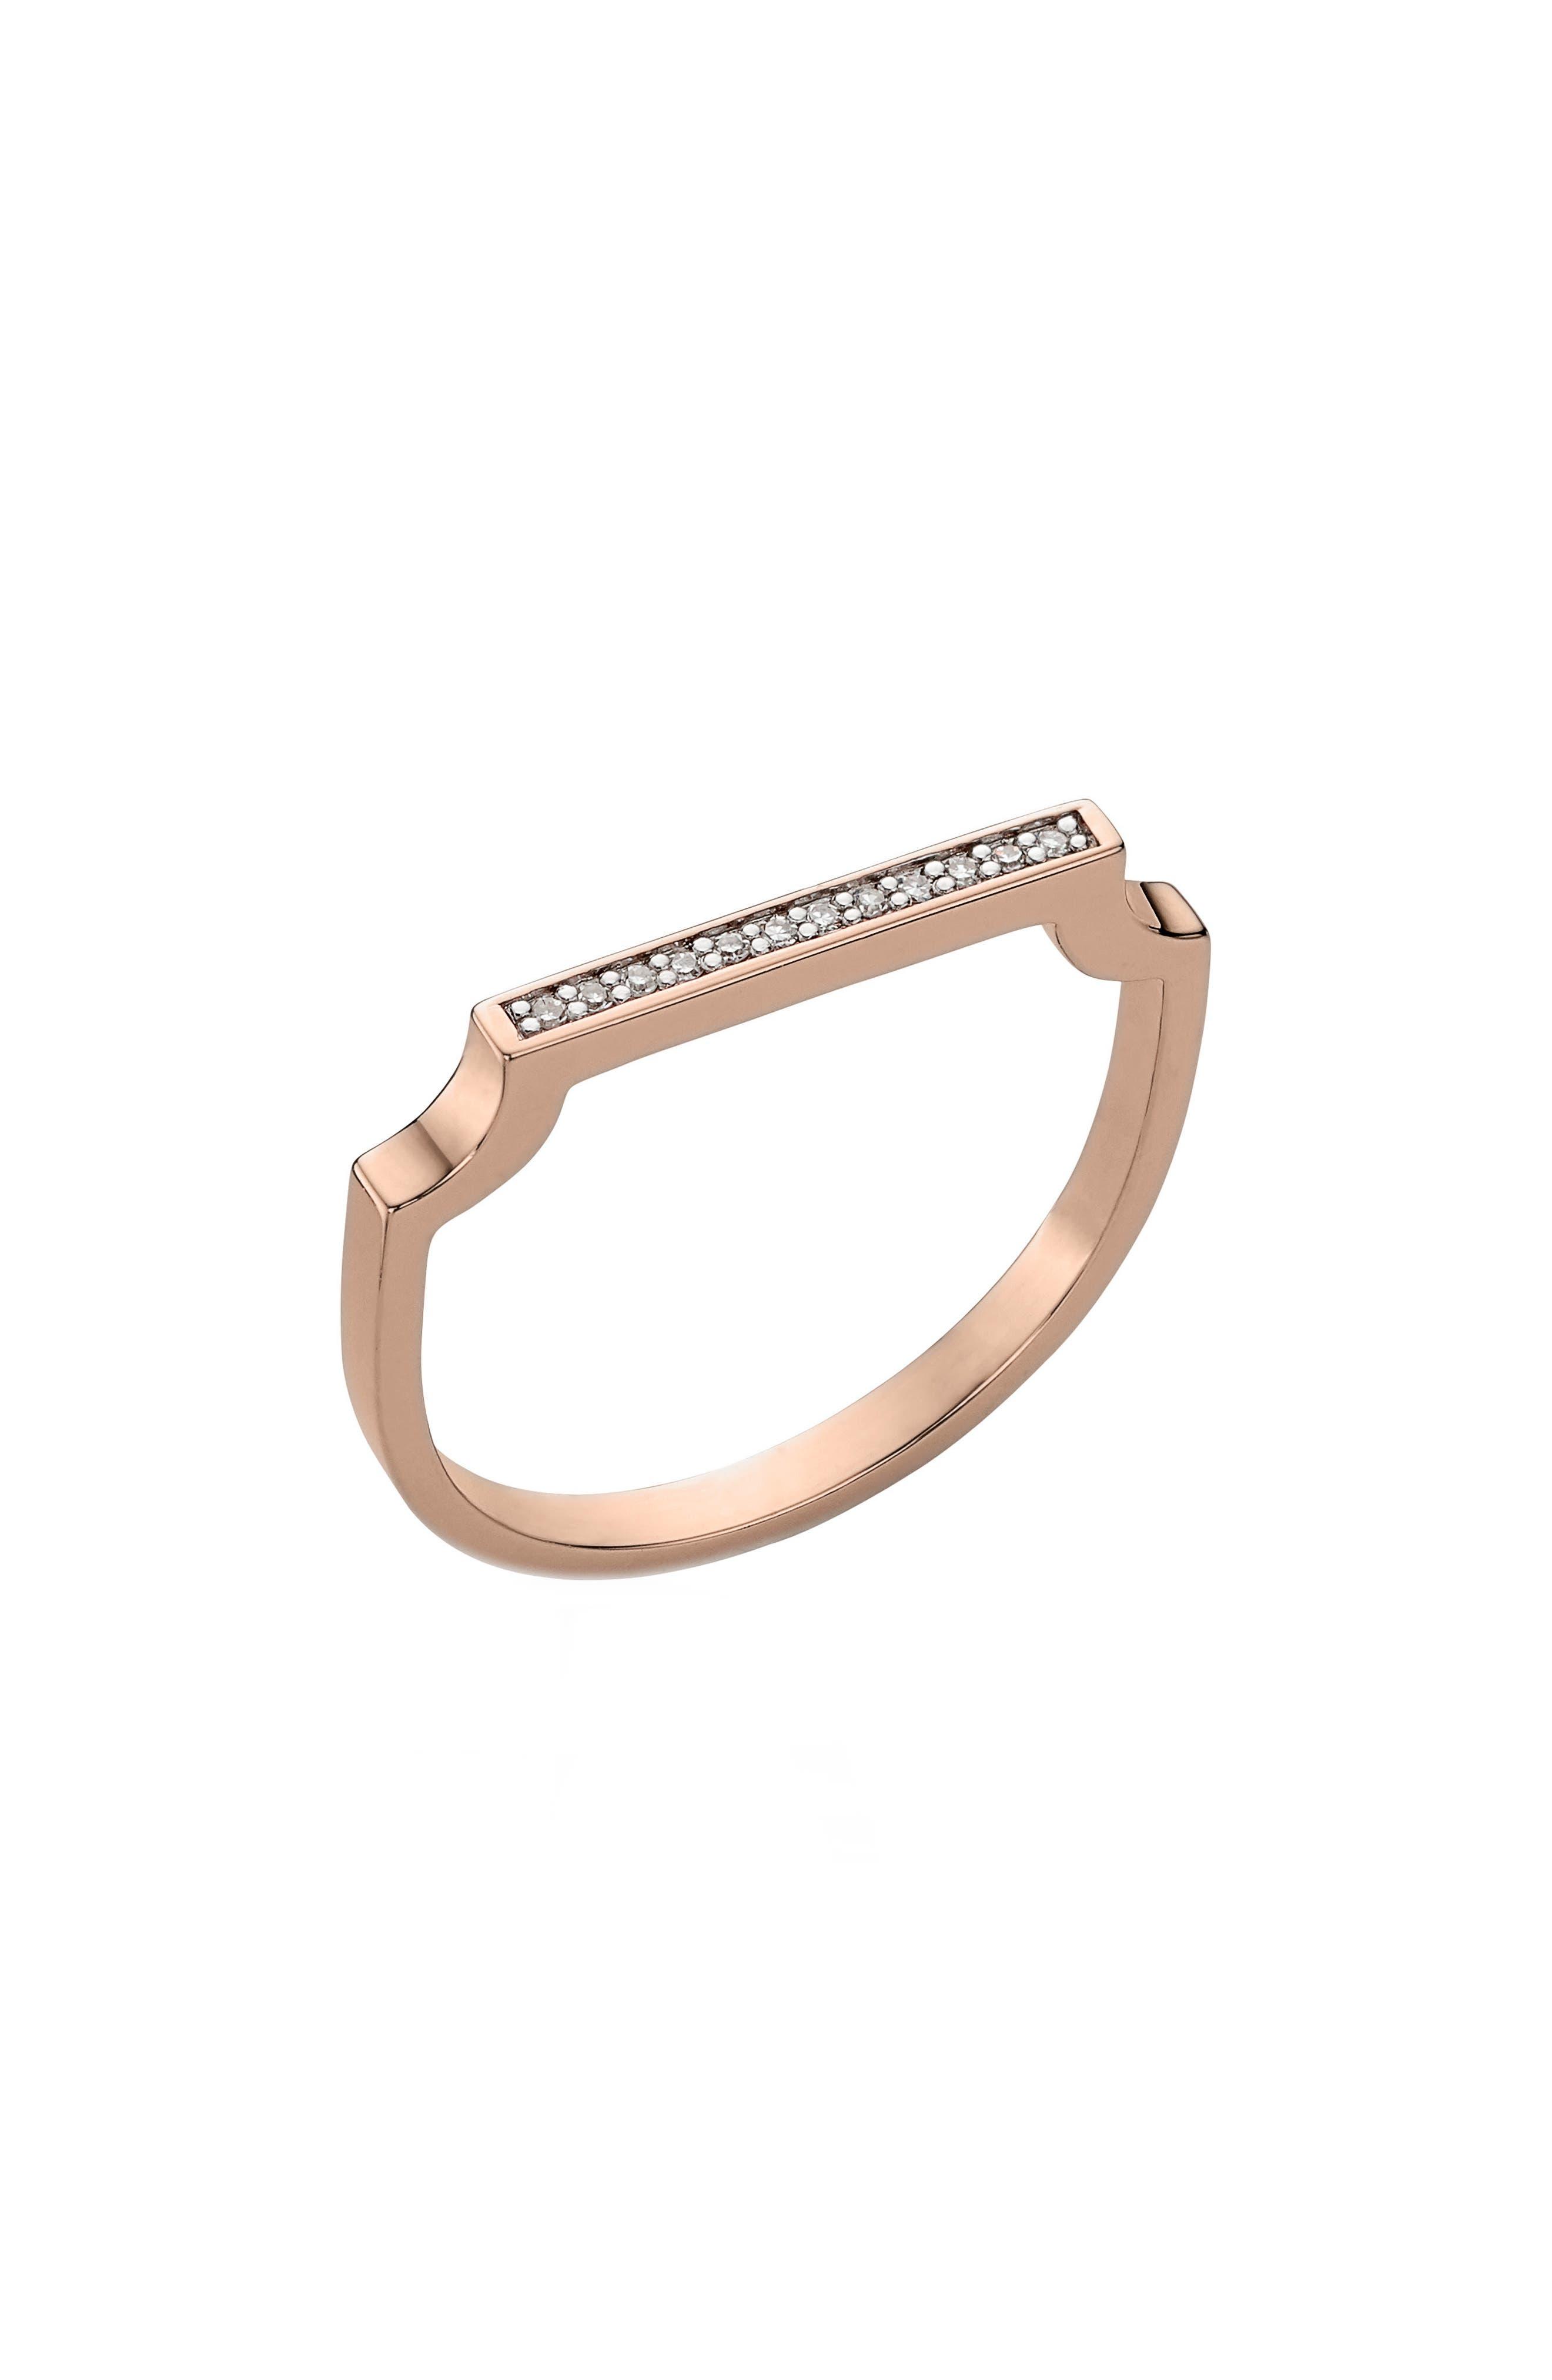 Signature Thin Diamond Ring,                         Main,                         color, Rose Gold/ Diamond